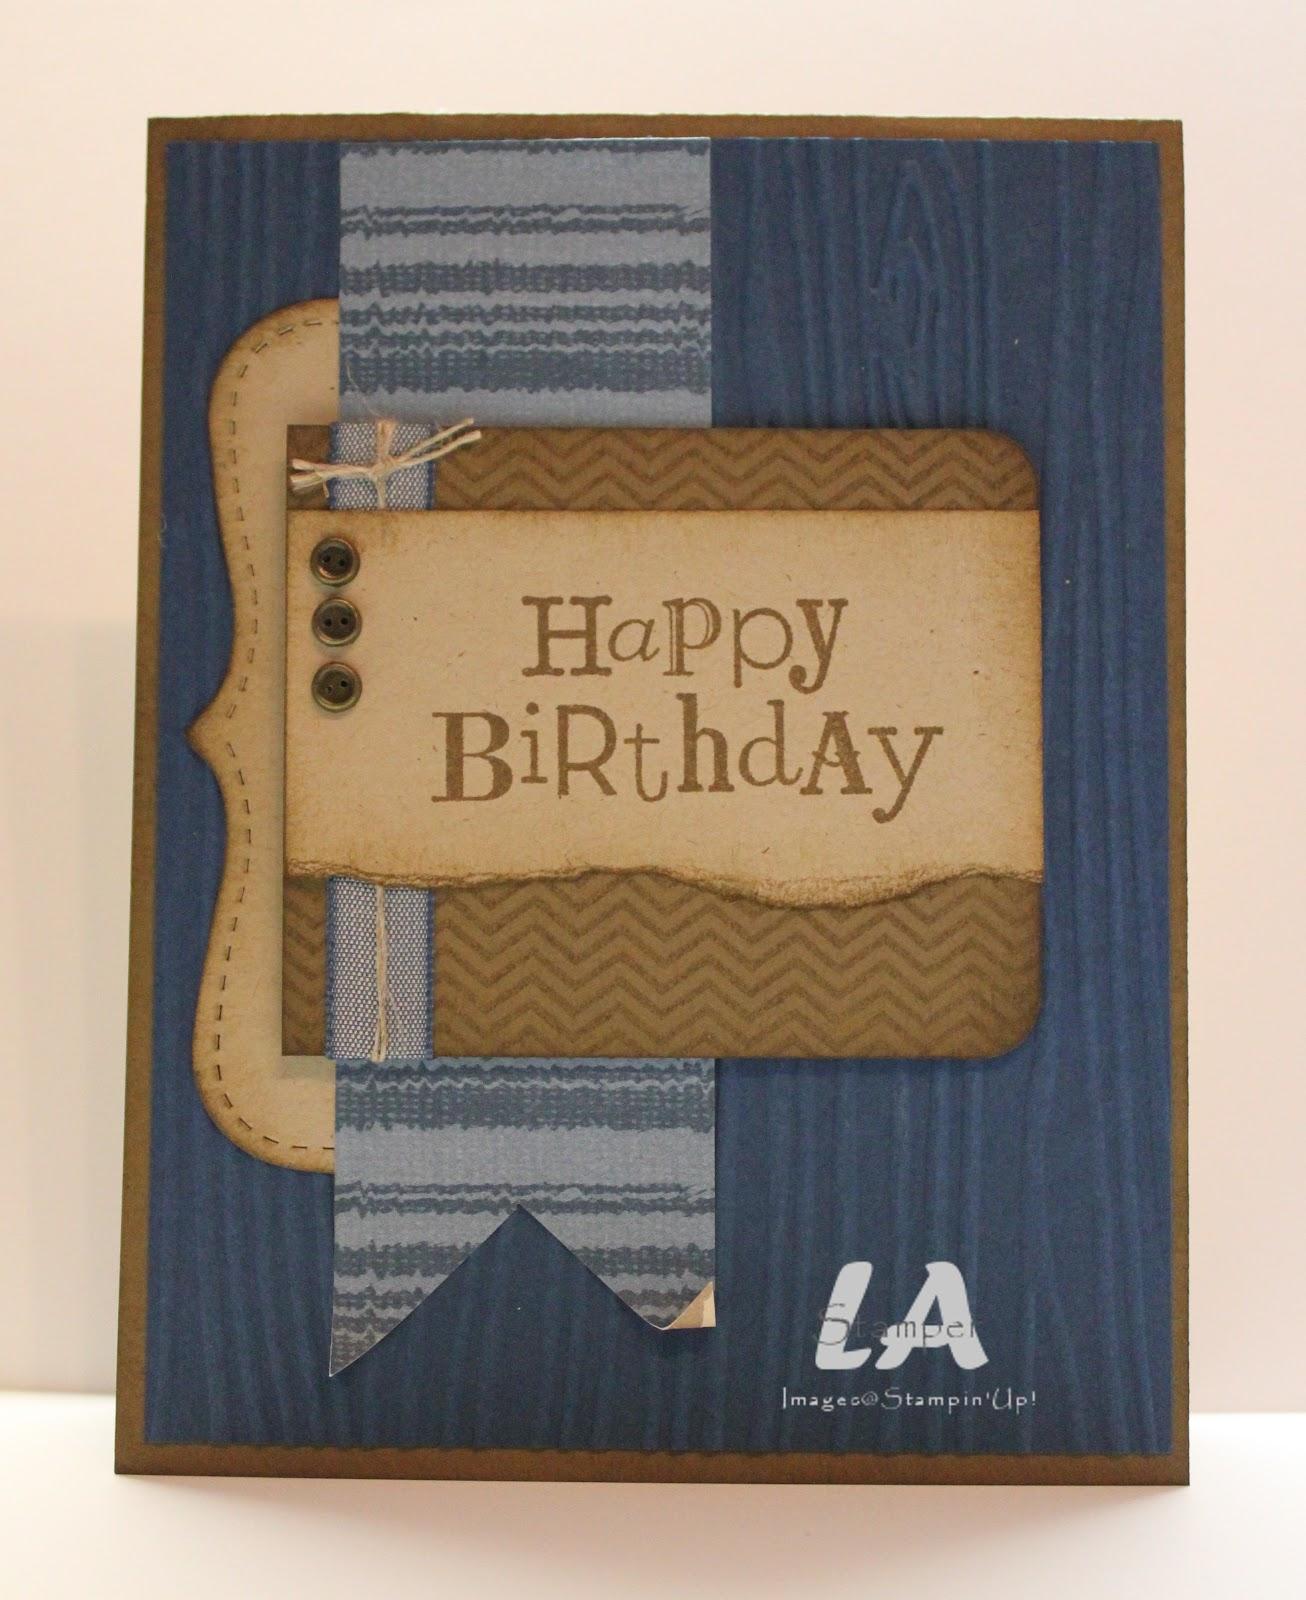 LA Stamper: Happy Birthday, Man